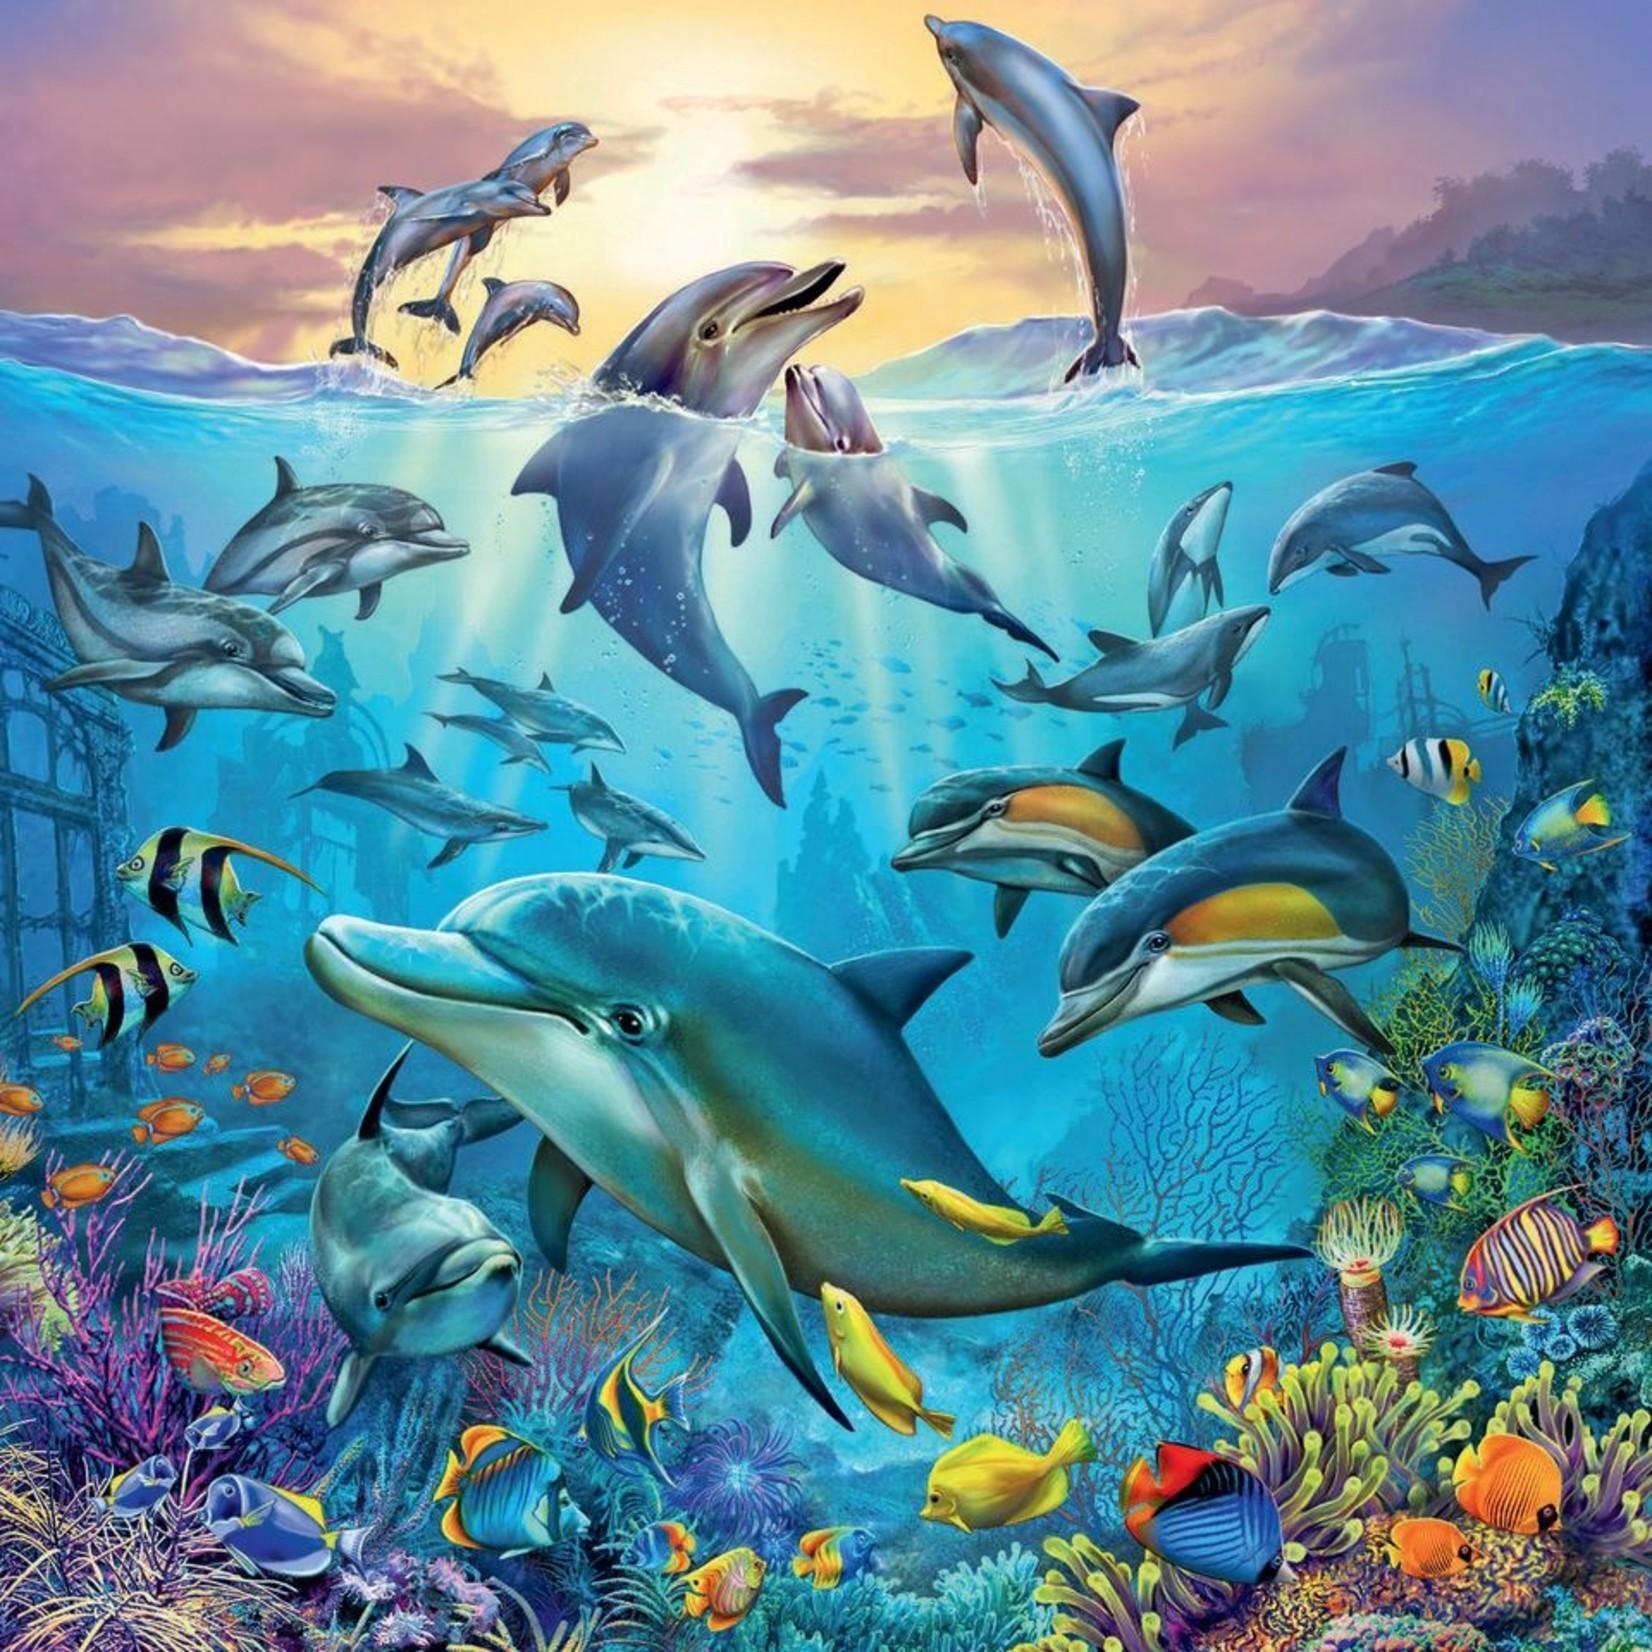 Ravensburger Ocean Life 3x49pc